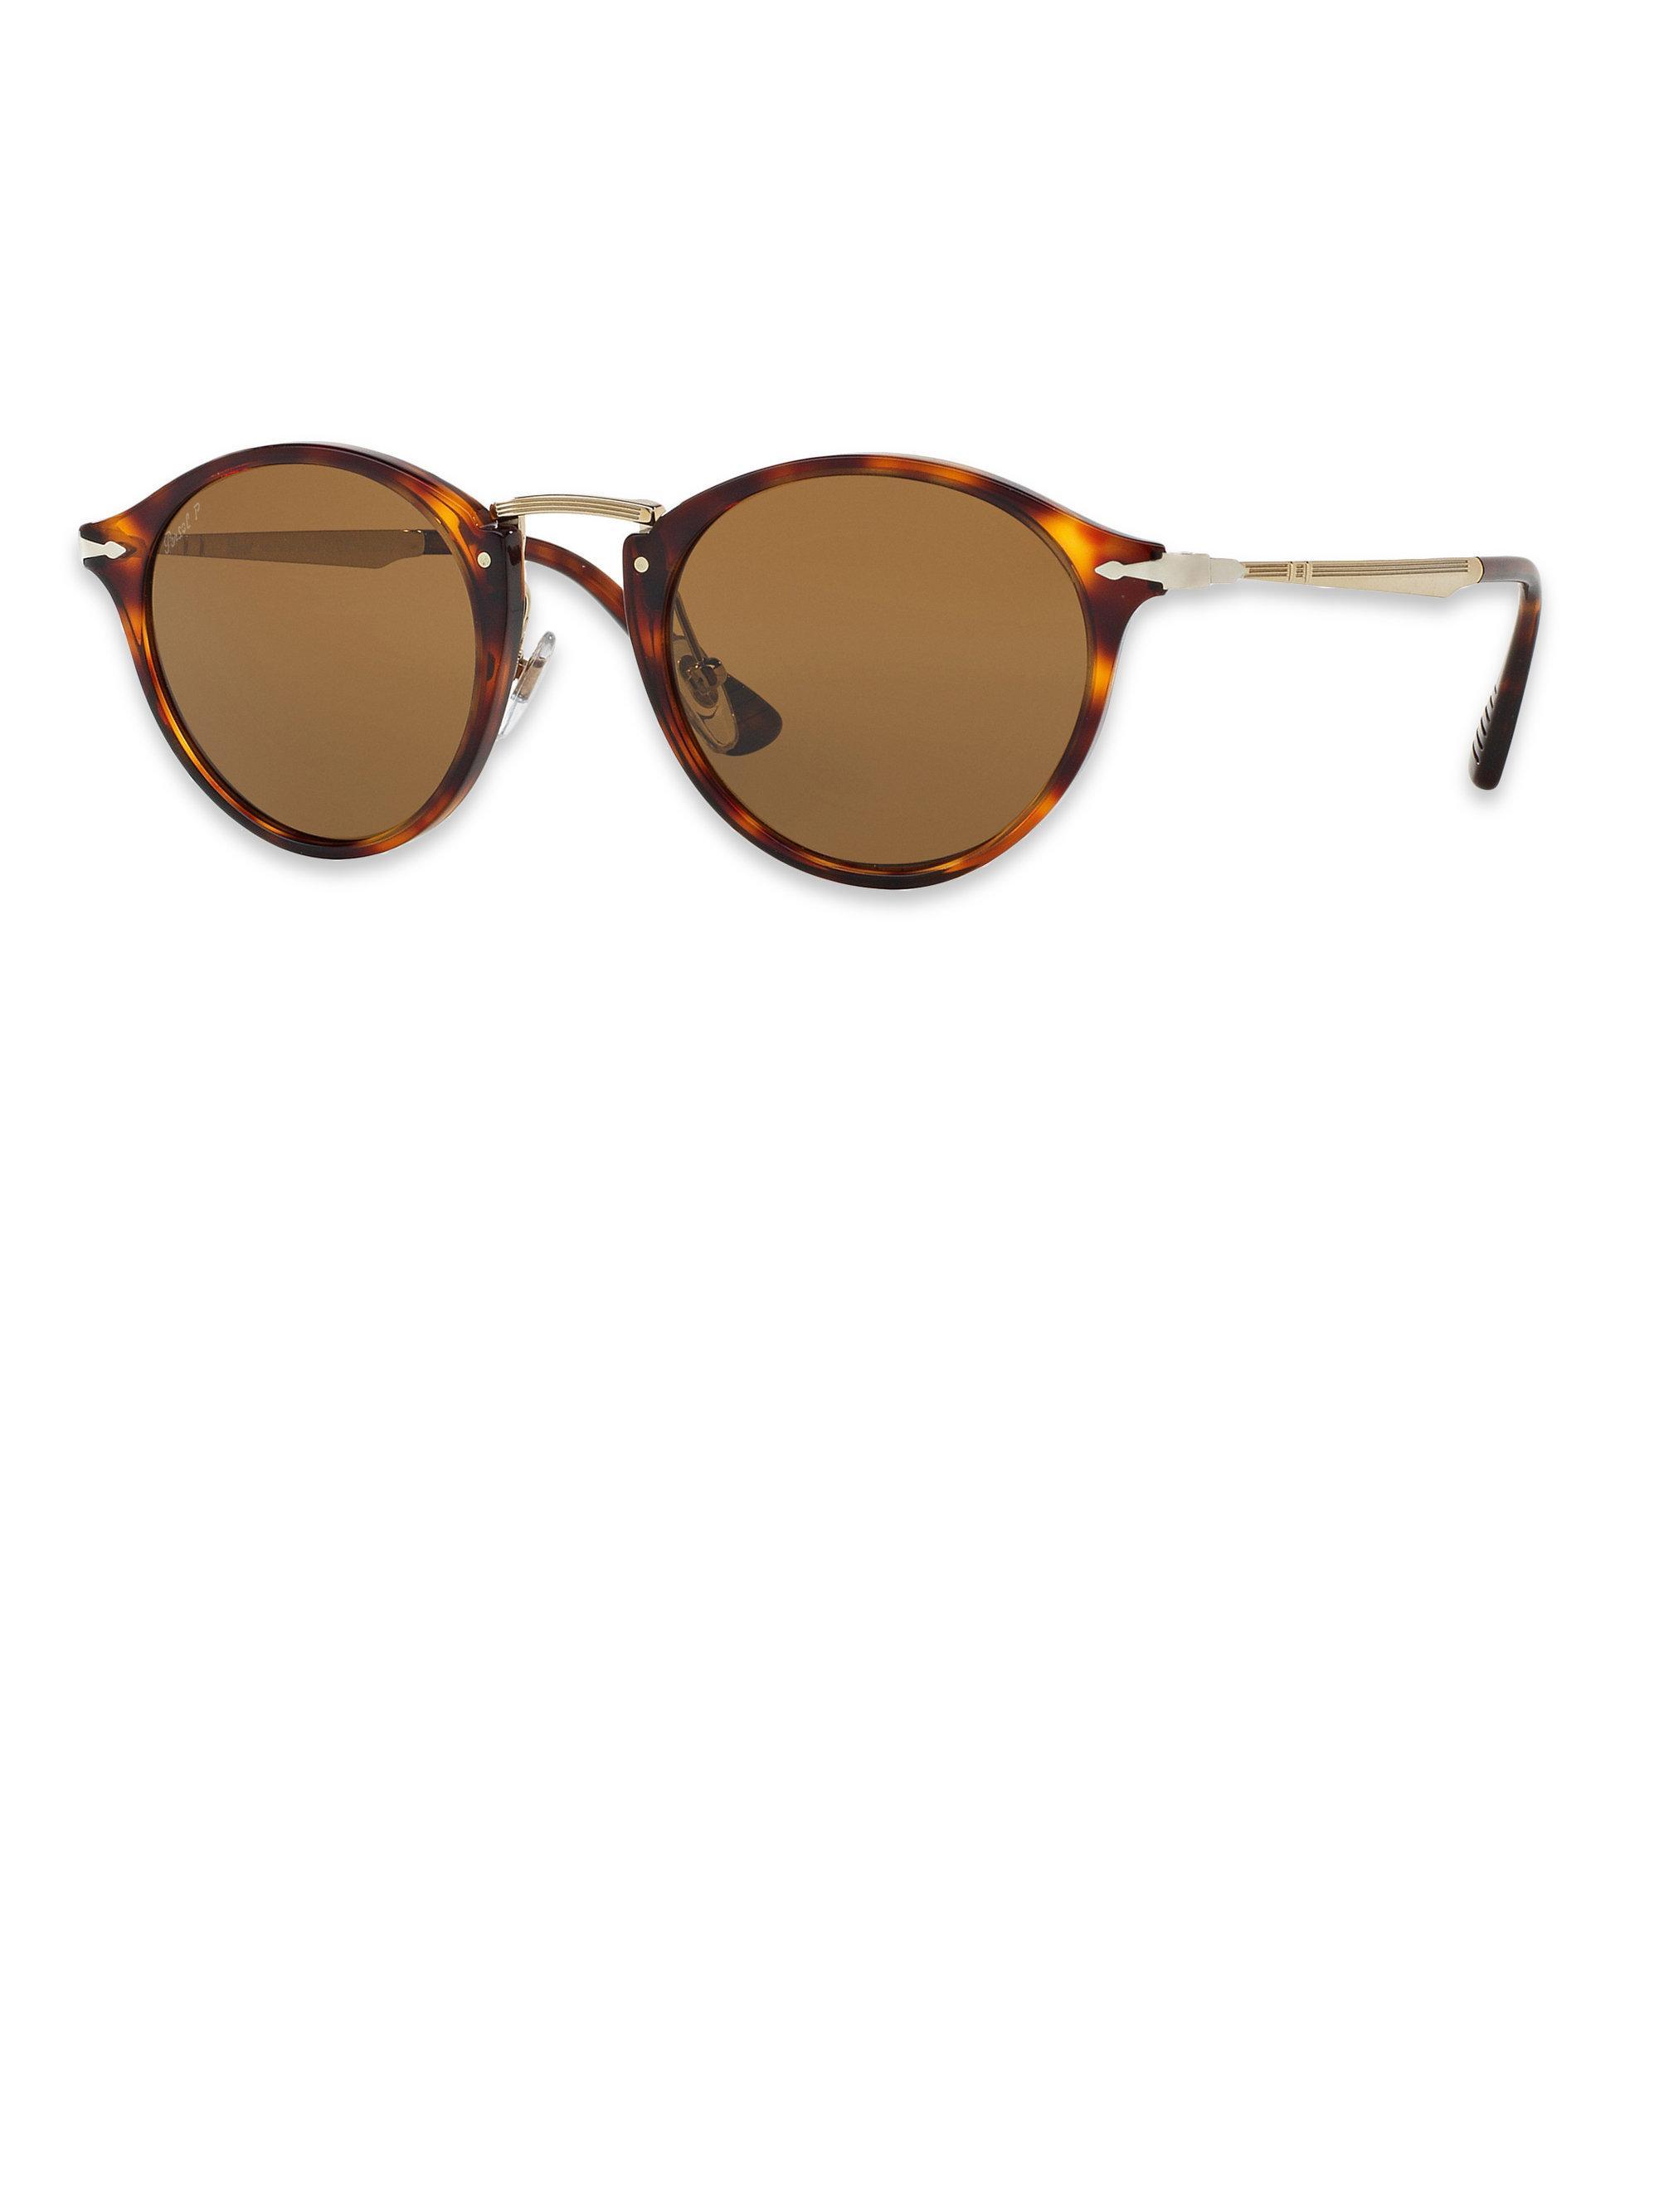 701c419d6c5f Brown Polarized Sunglasses In Calligrapher 51mm Persol Phantos Lyst wT0qtB